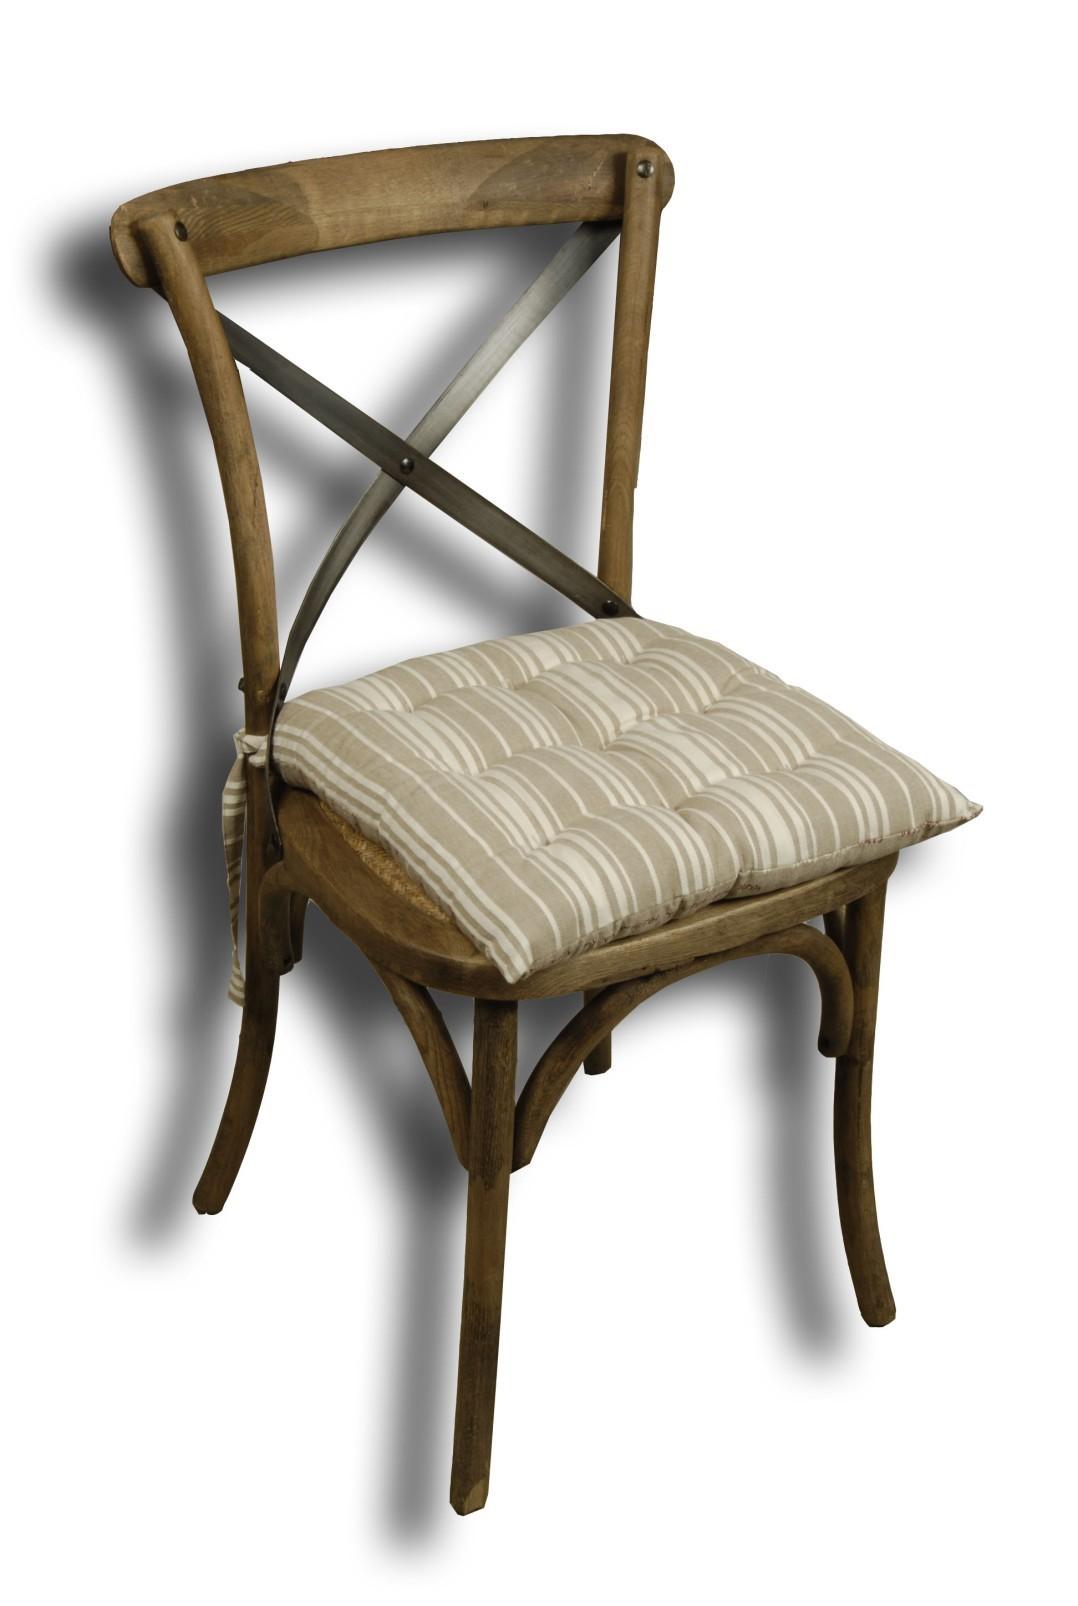 Chair cushion 42x42 histoire de cuisine.jpg